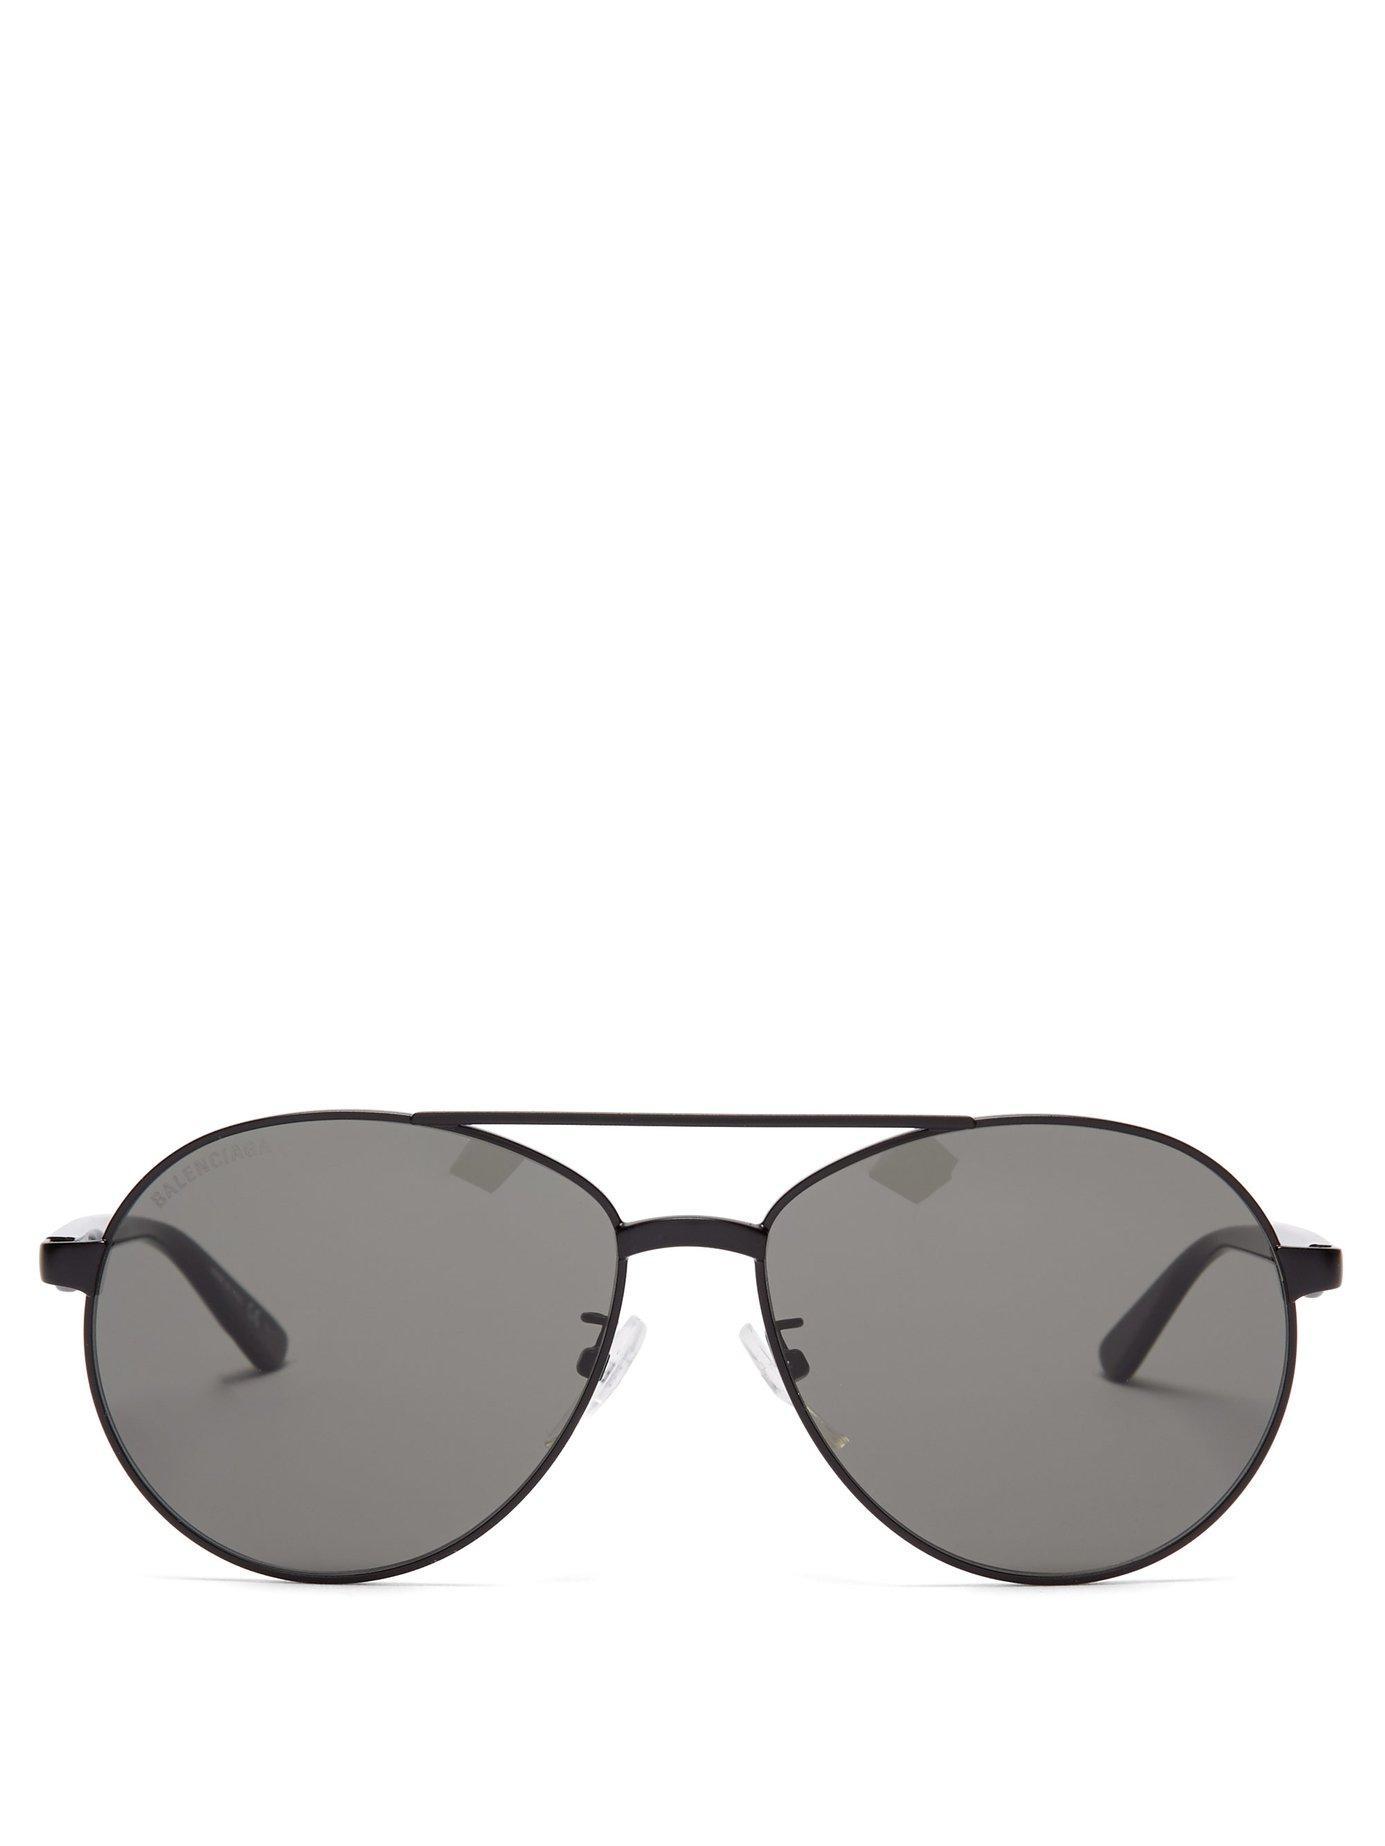 dd03299afce Lyst - Balenciaga Aviator Metal And Acetate Sunglasses in Black for Men